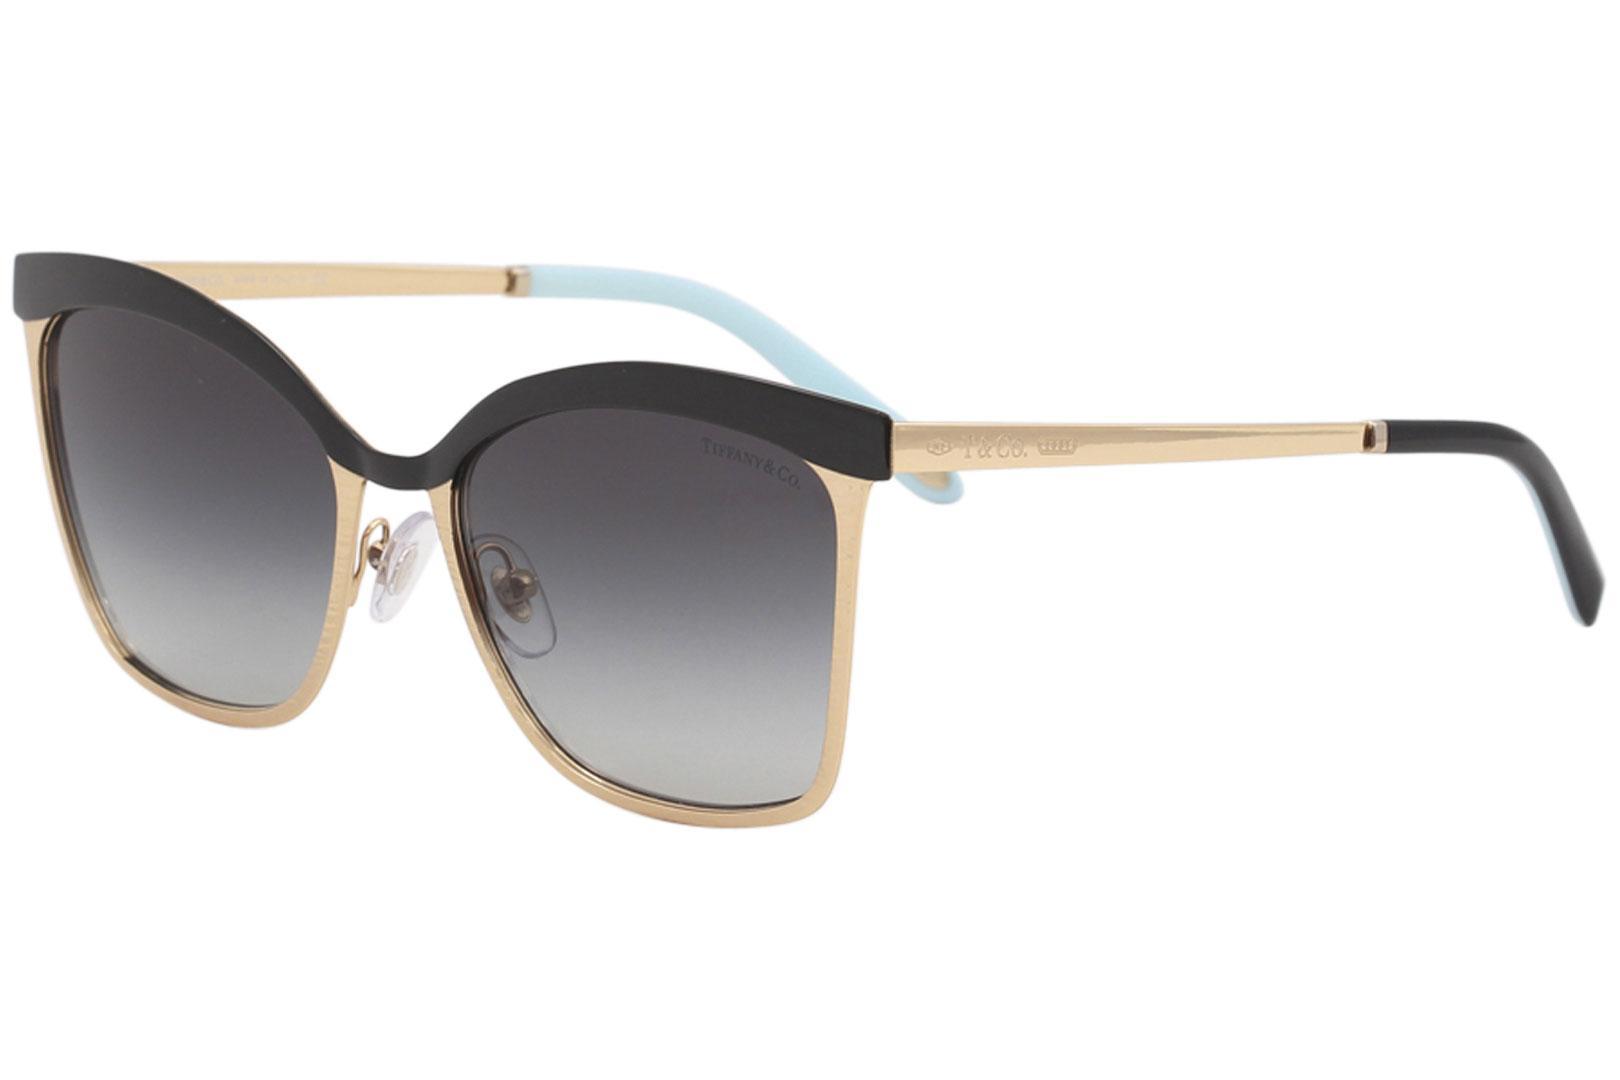 fc623265f4a4 Tiffany & Co Women's TF3060 TF/3060 Fashion Square Sunglasses by Tiffany &  Co.